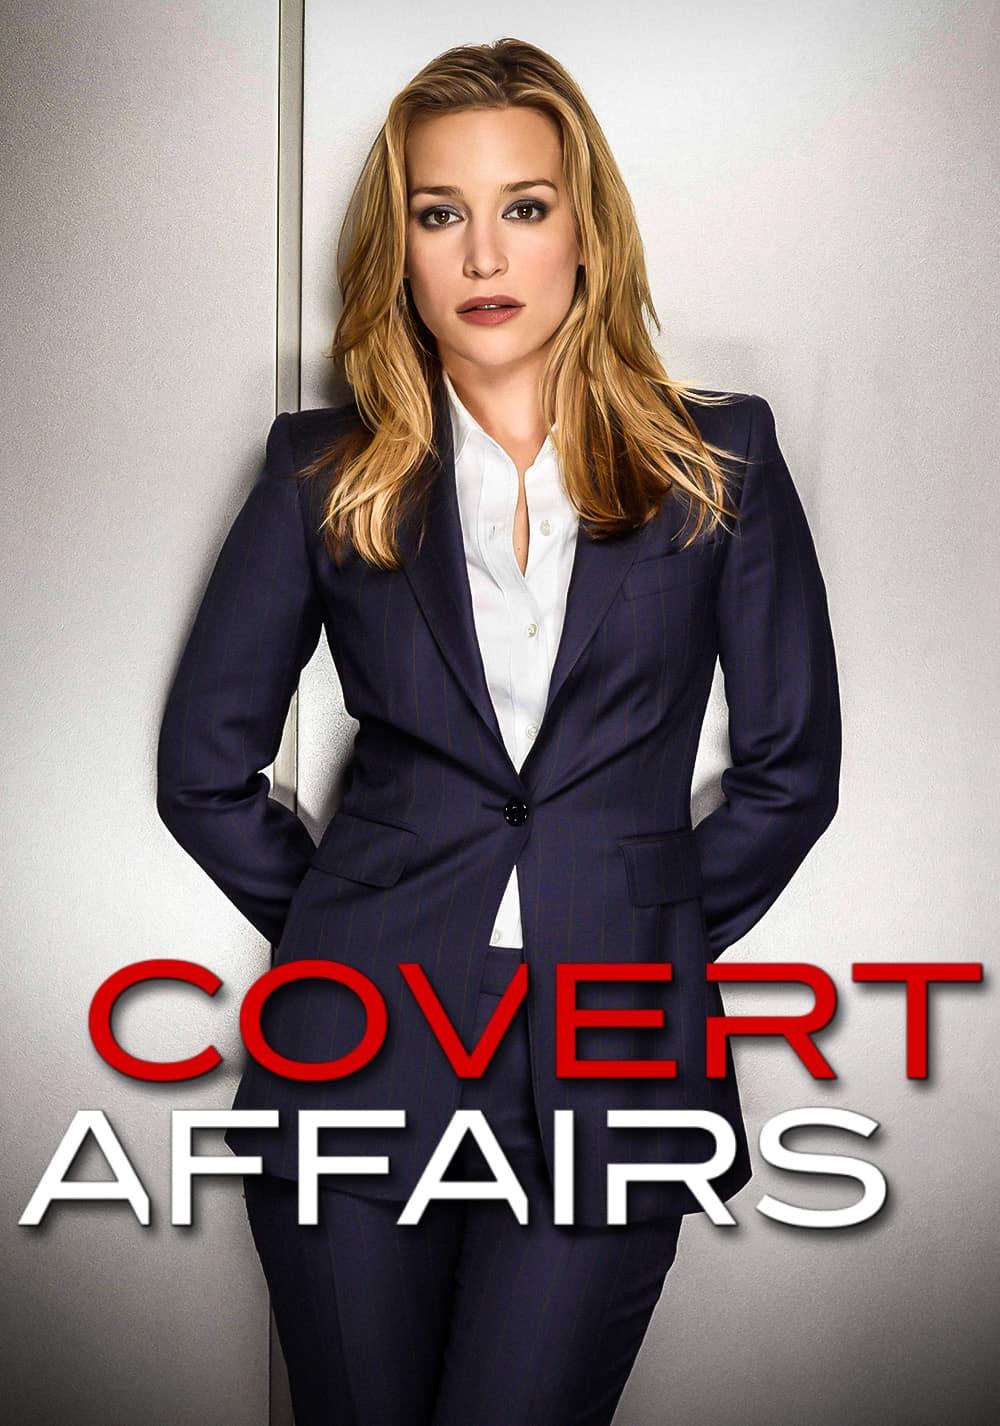 Covert Affairs Season 1 สวยซ่อนเล็บ ปี 1 ซับไทย EP1 – EP11 [จบ]